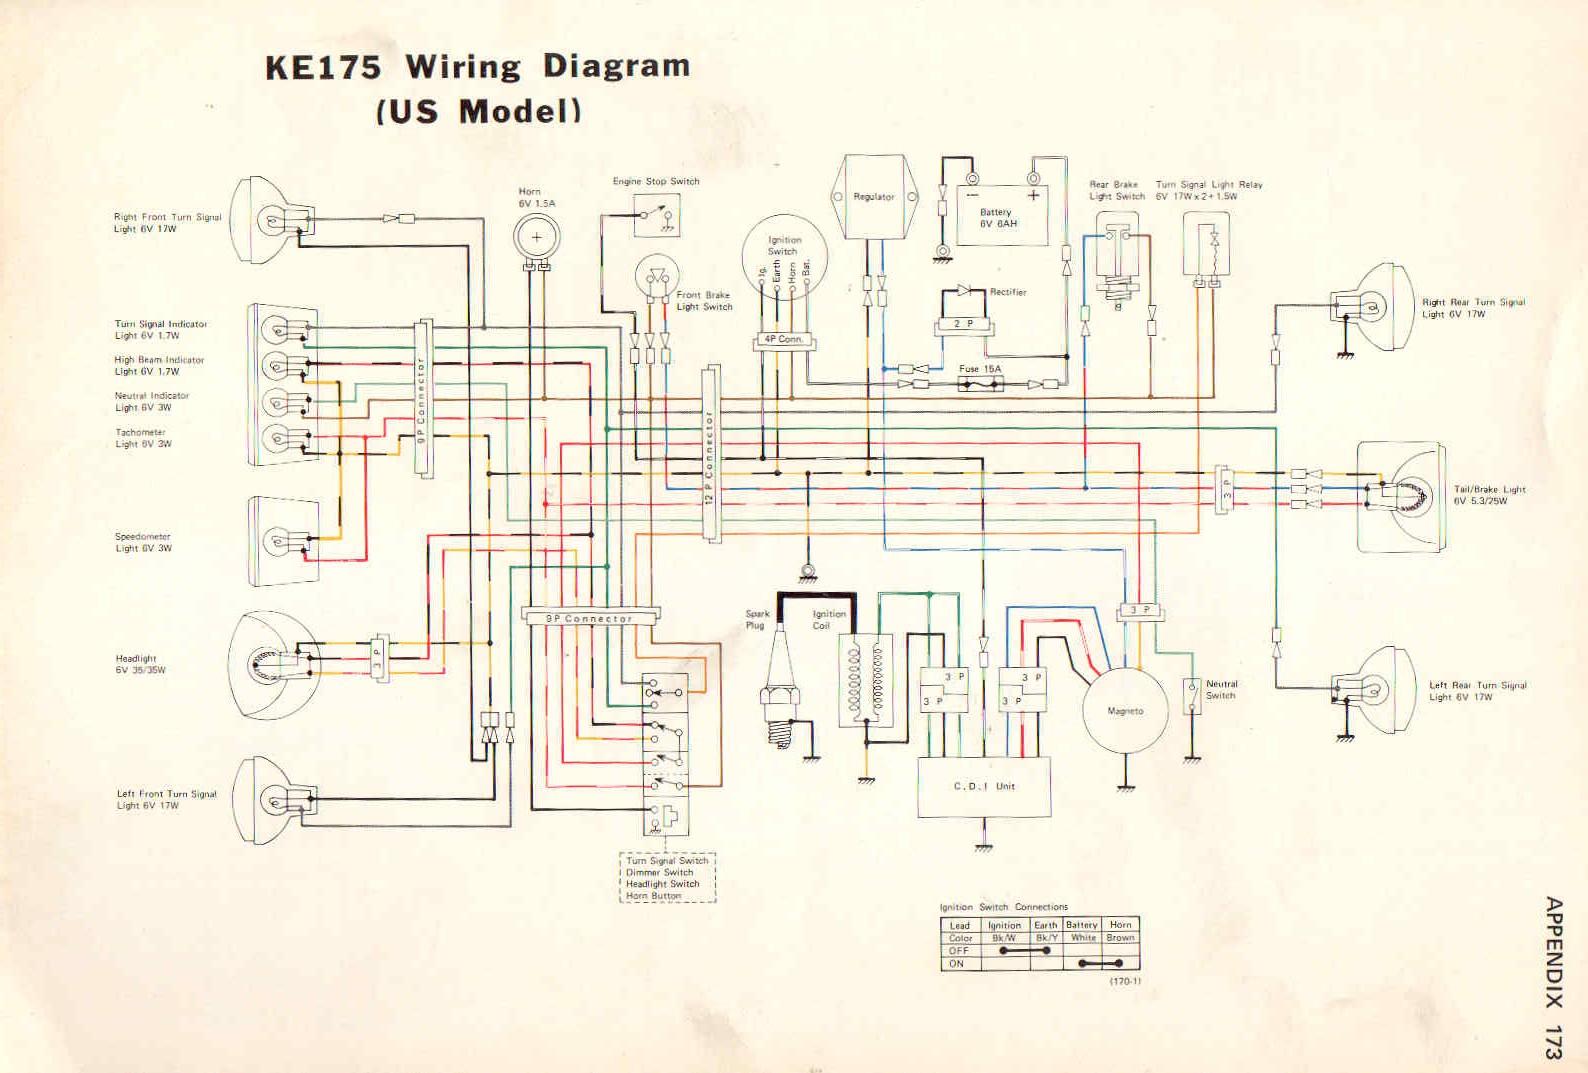 Kawasaki KE175 Service Manual & Wiring Diagram